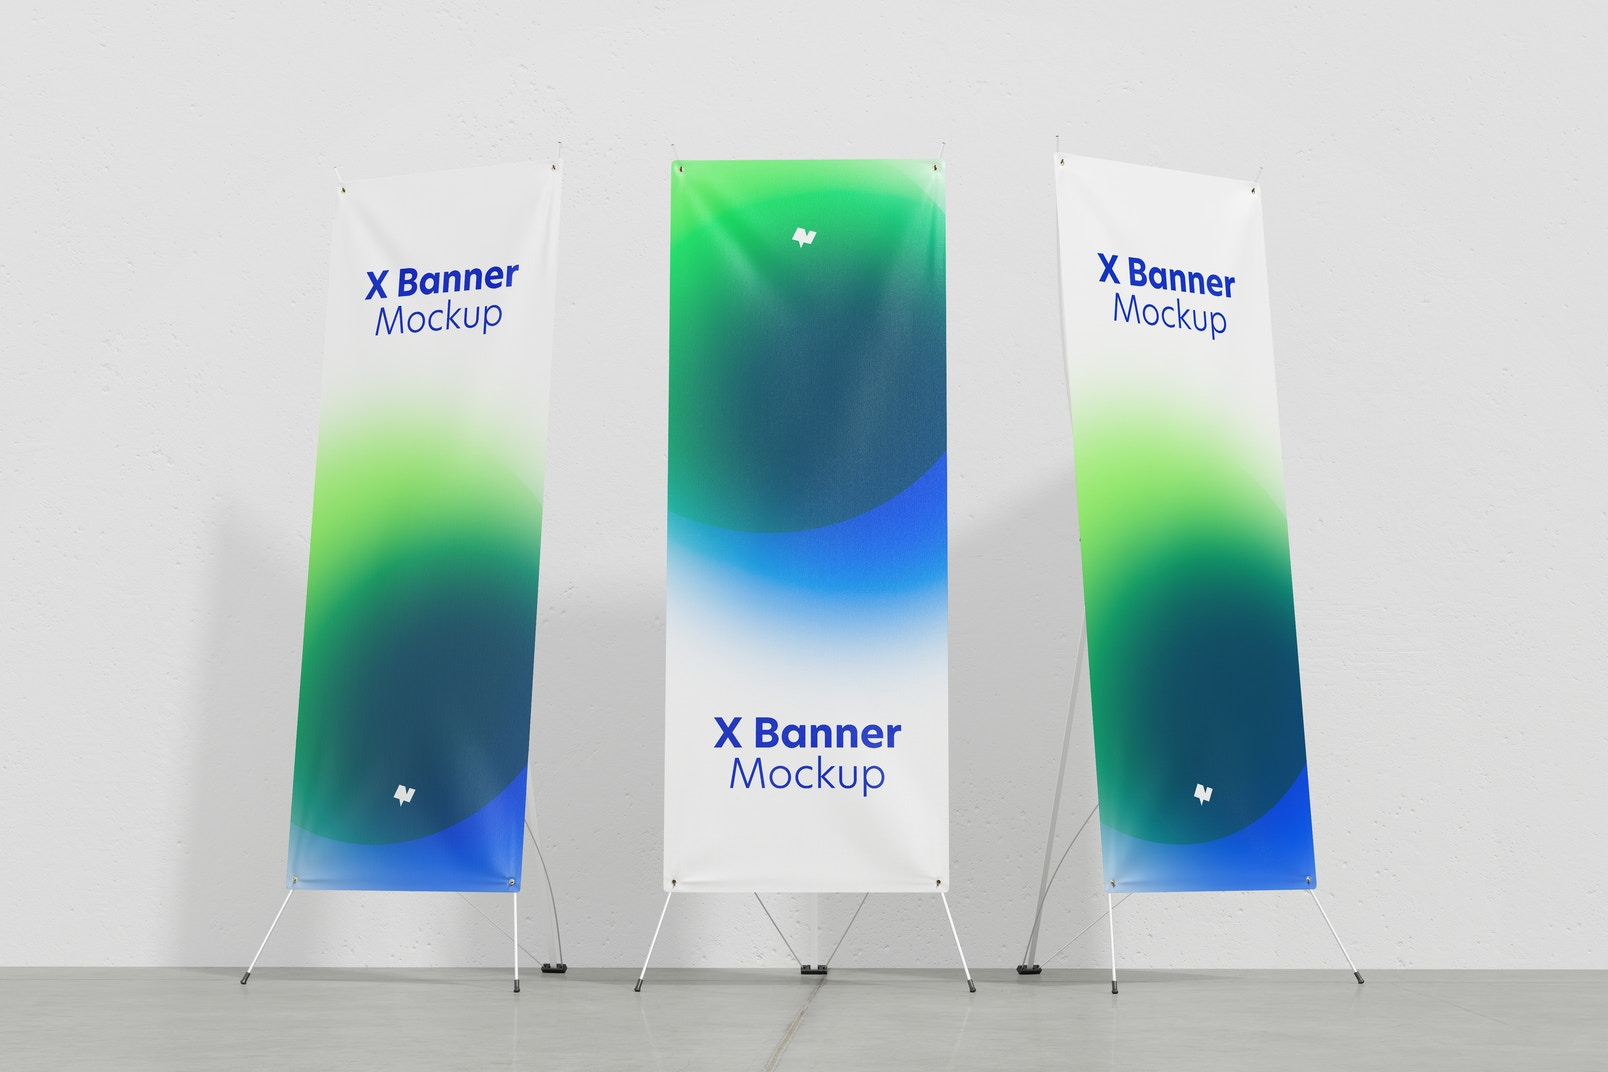 X Banner Mockup, Low Angle View